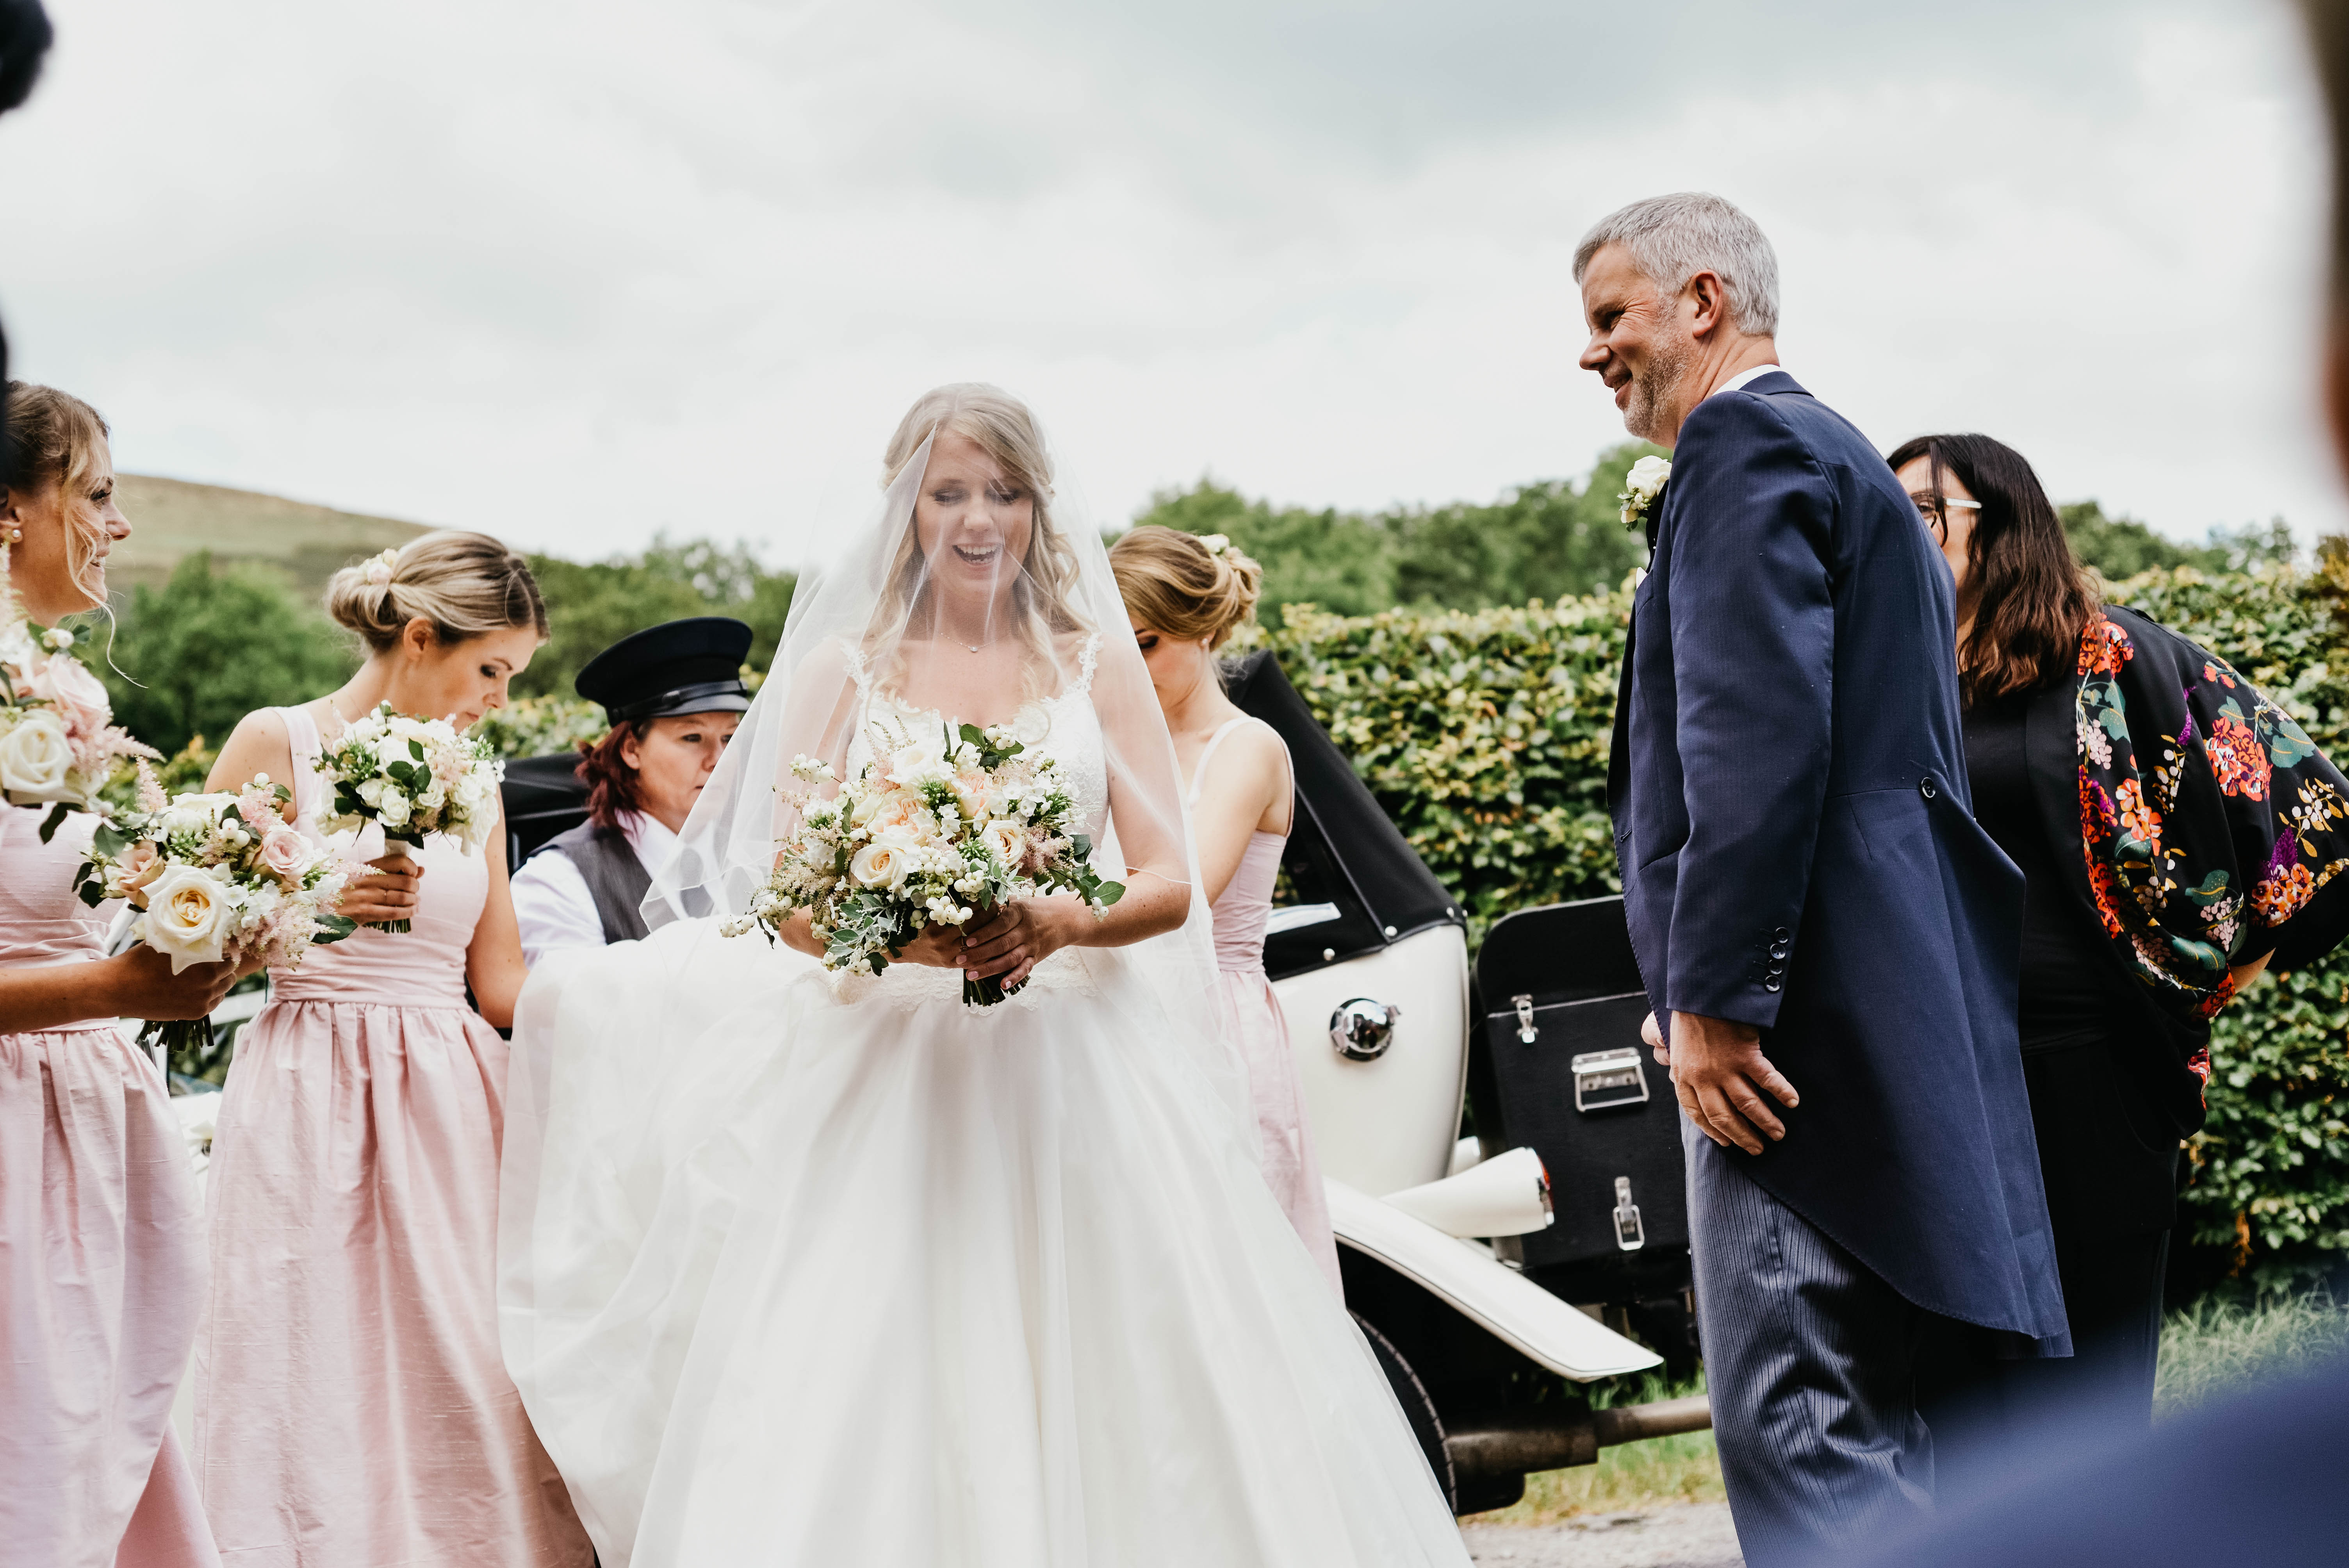 A bride smiles as her bridesmaids straighten her dress